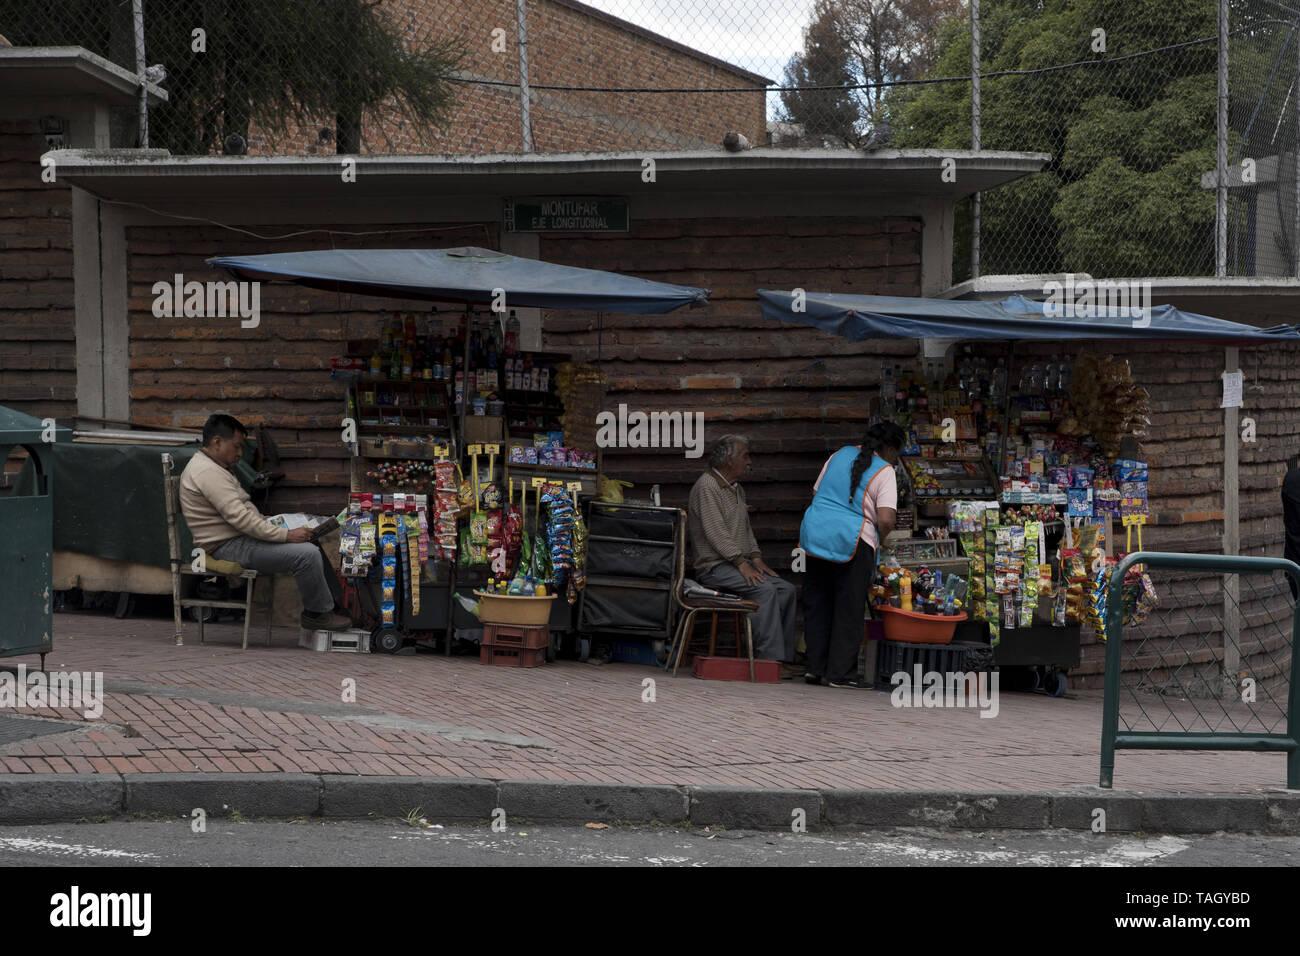 hawker waiting for clients in Quito in Ecuador.  Straßenhändler warten in Quito in Ecuador auf Kunden. - Stock Image